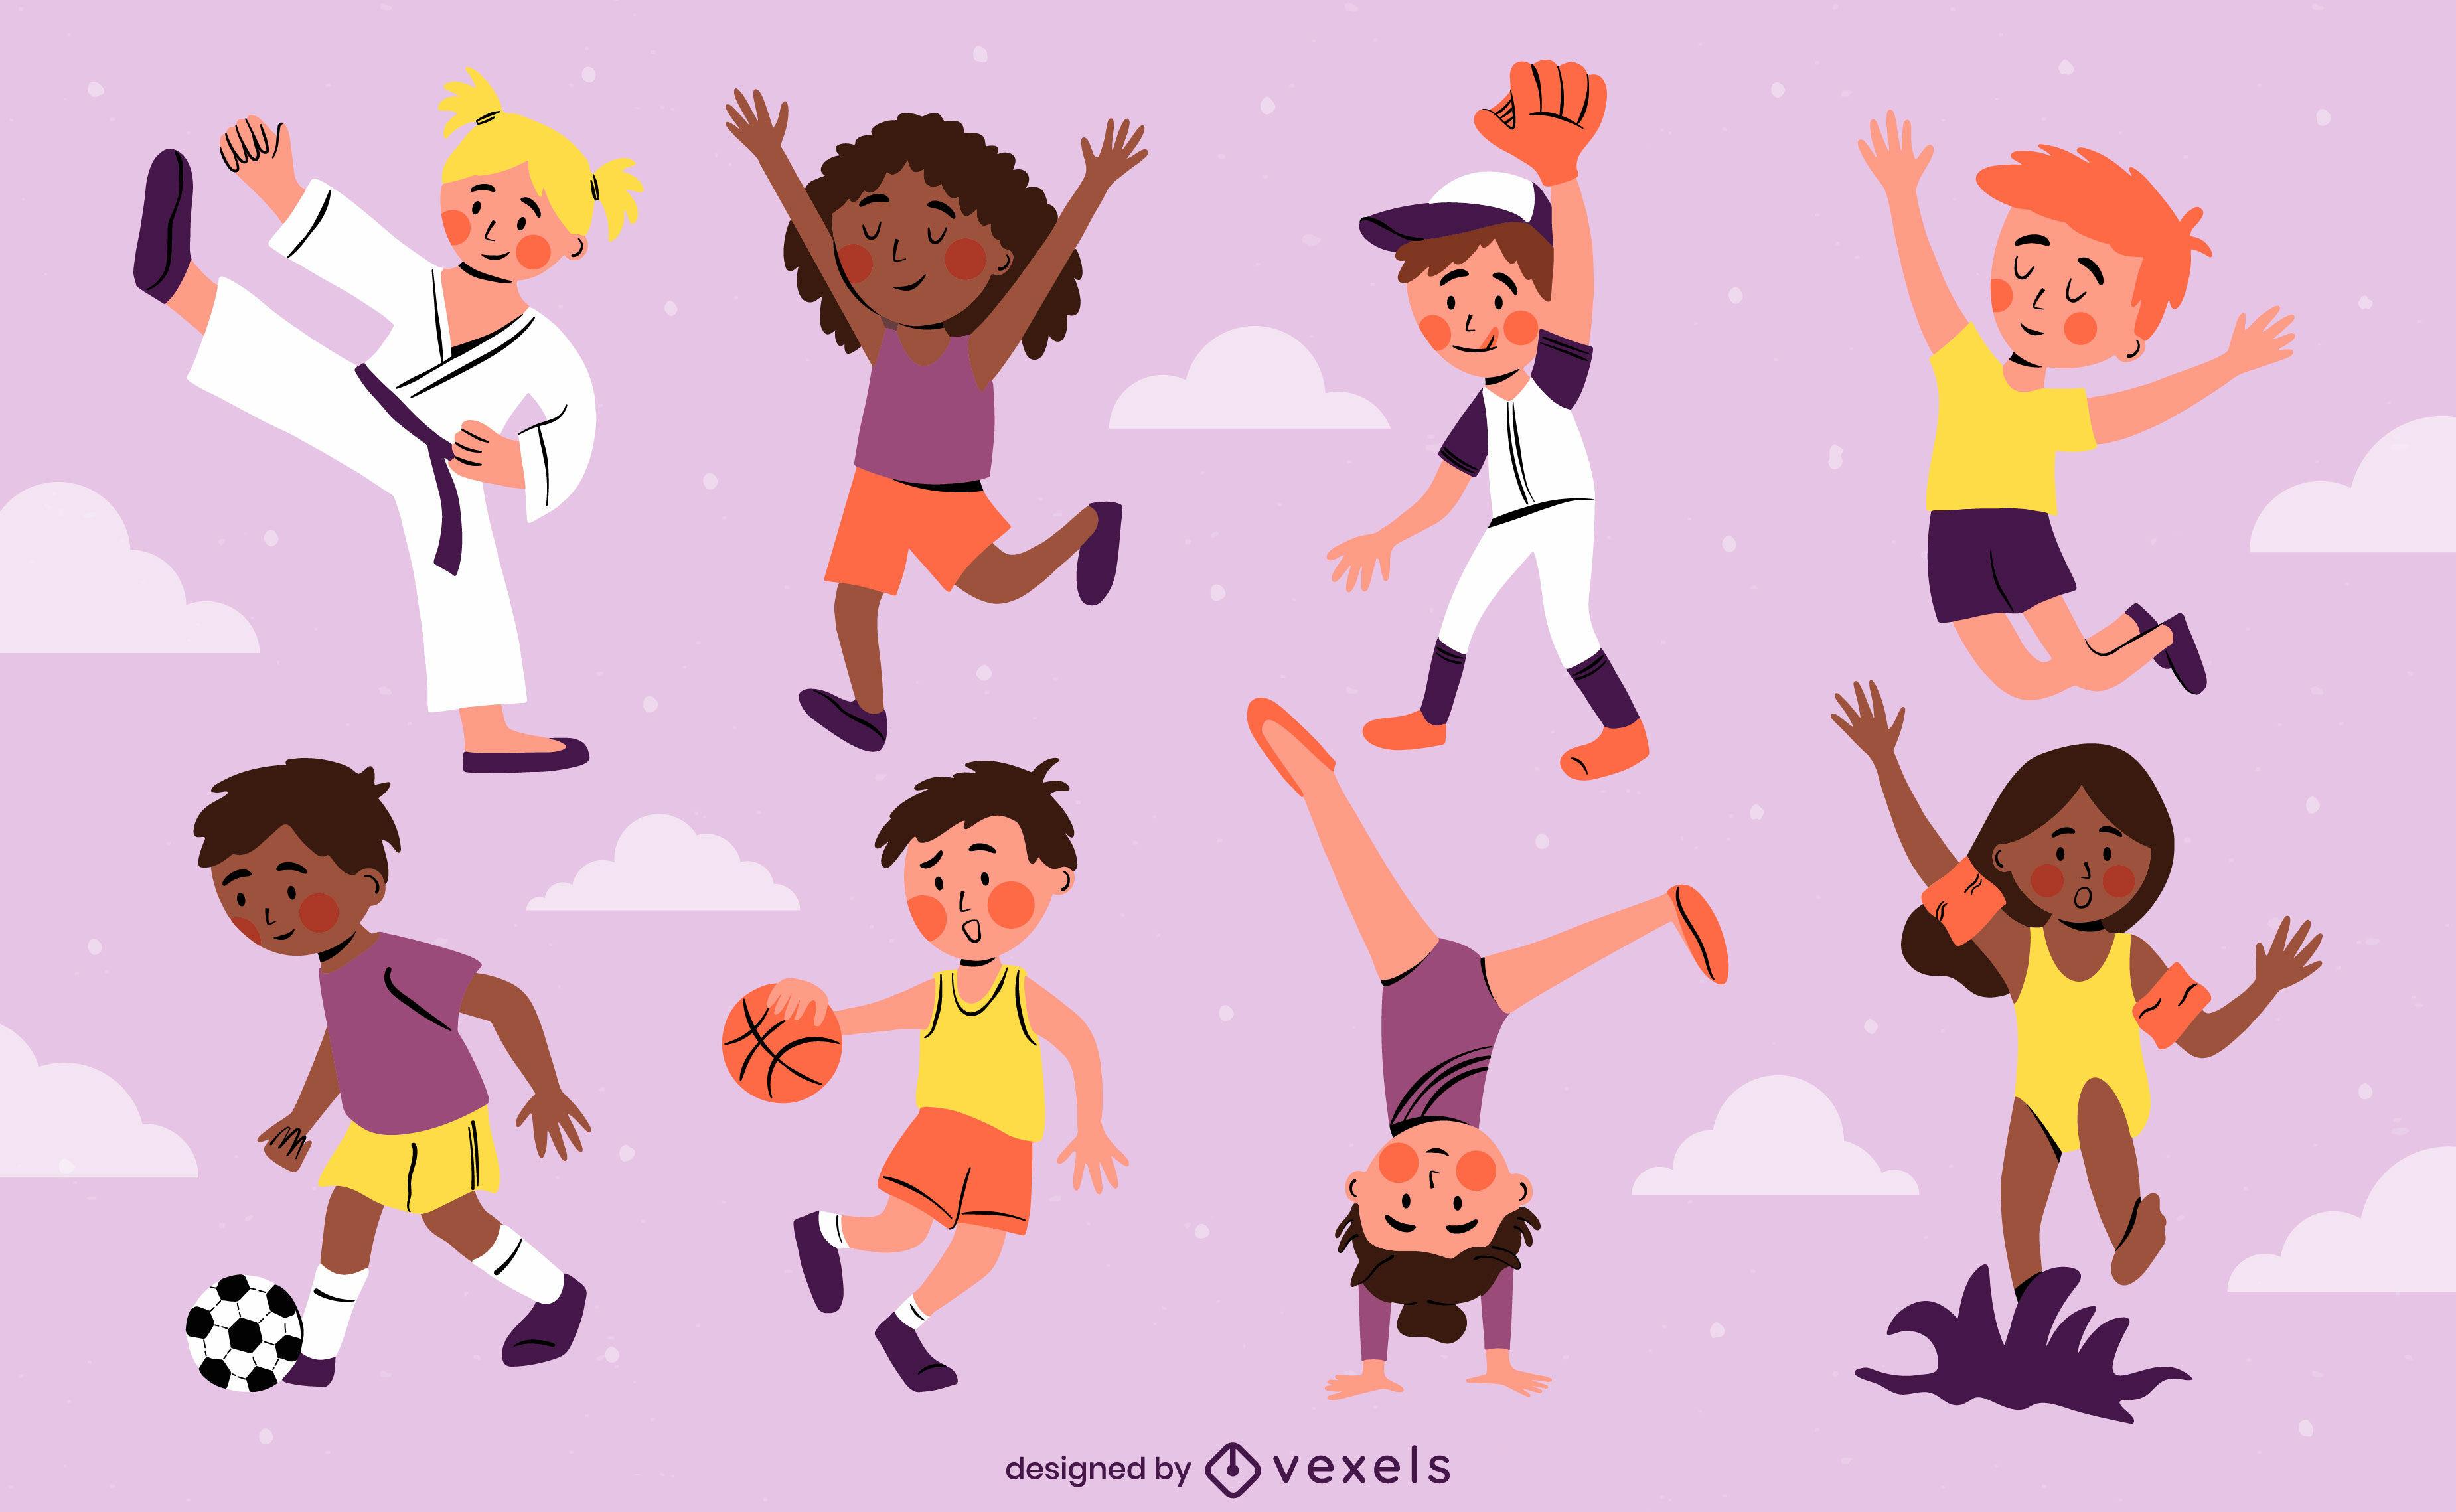 Conjunto de personagens de esportes infantis